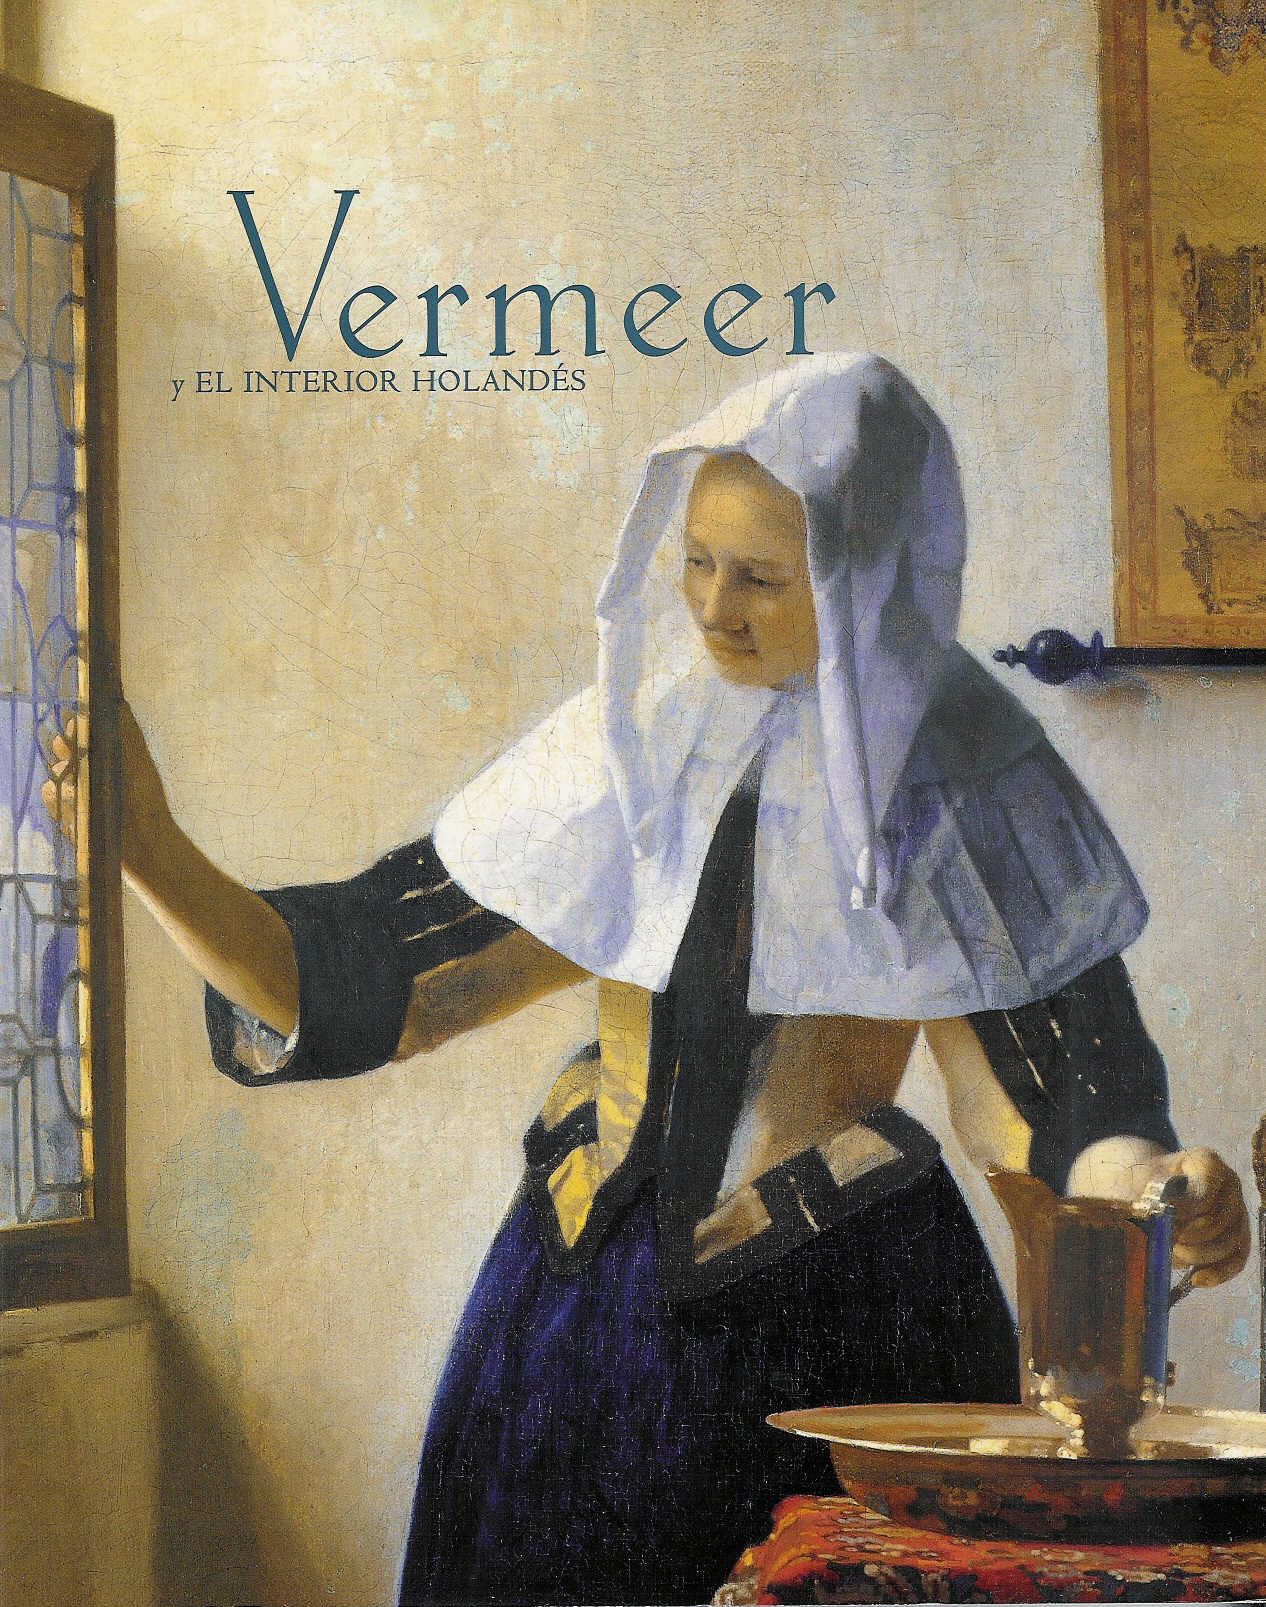 Vermeer y el interior holand s codart for Biographie de vermeer